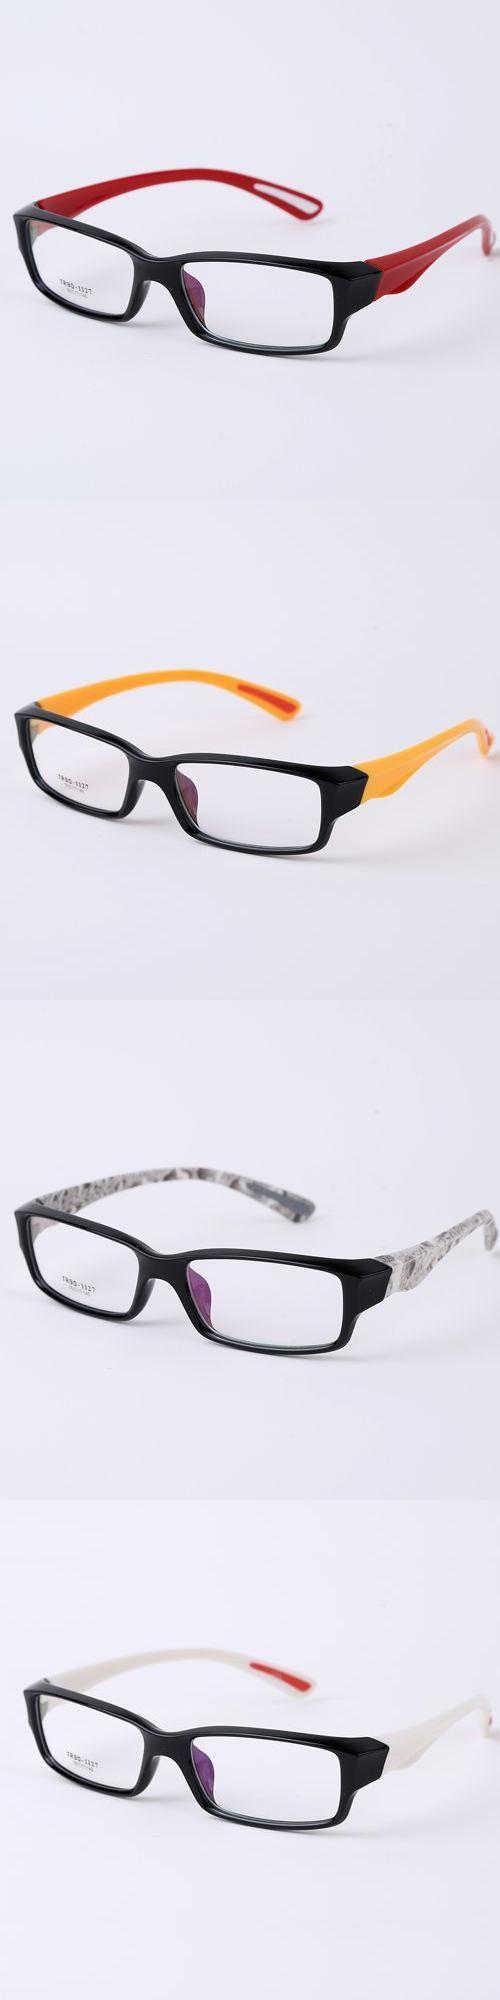 Ultra light optical eyewear frame glasses clear Prescription eyeglasses Tr90 Specatcles frame optical glasses 1127